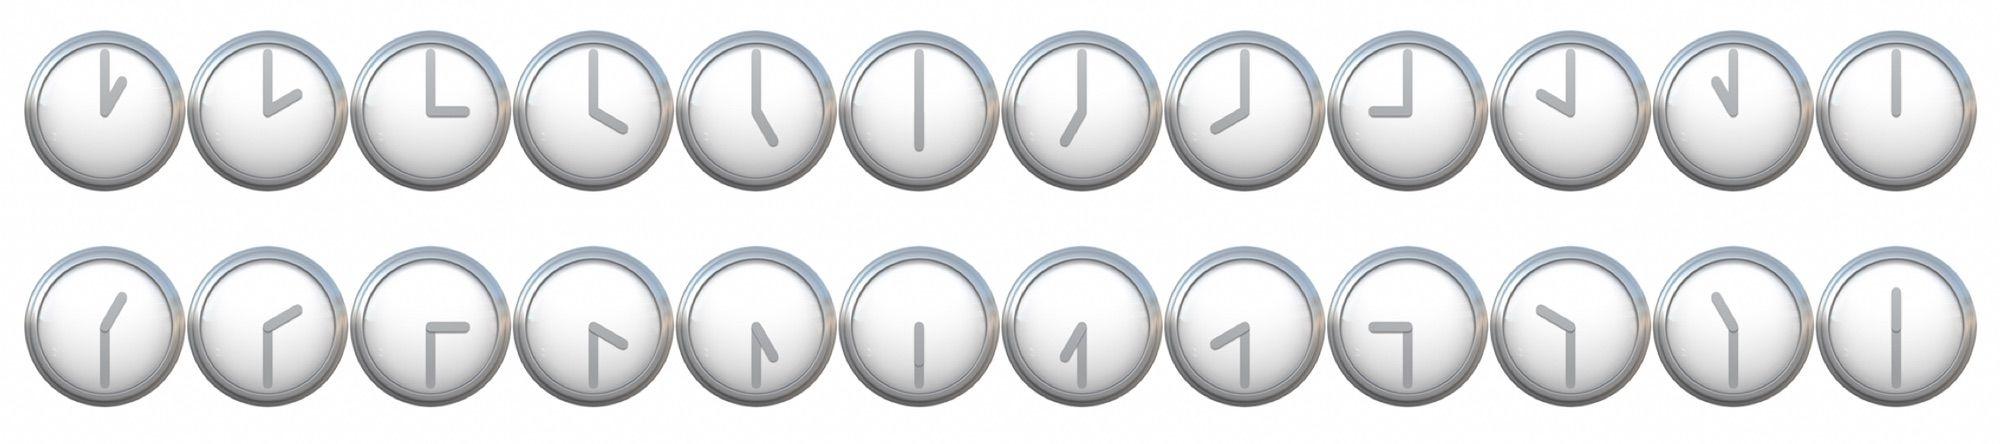 apple-clock-face-emojis-2021-emojipedia